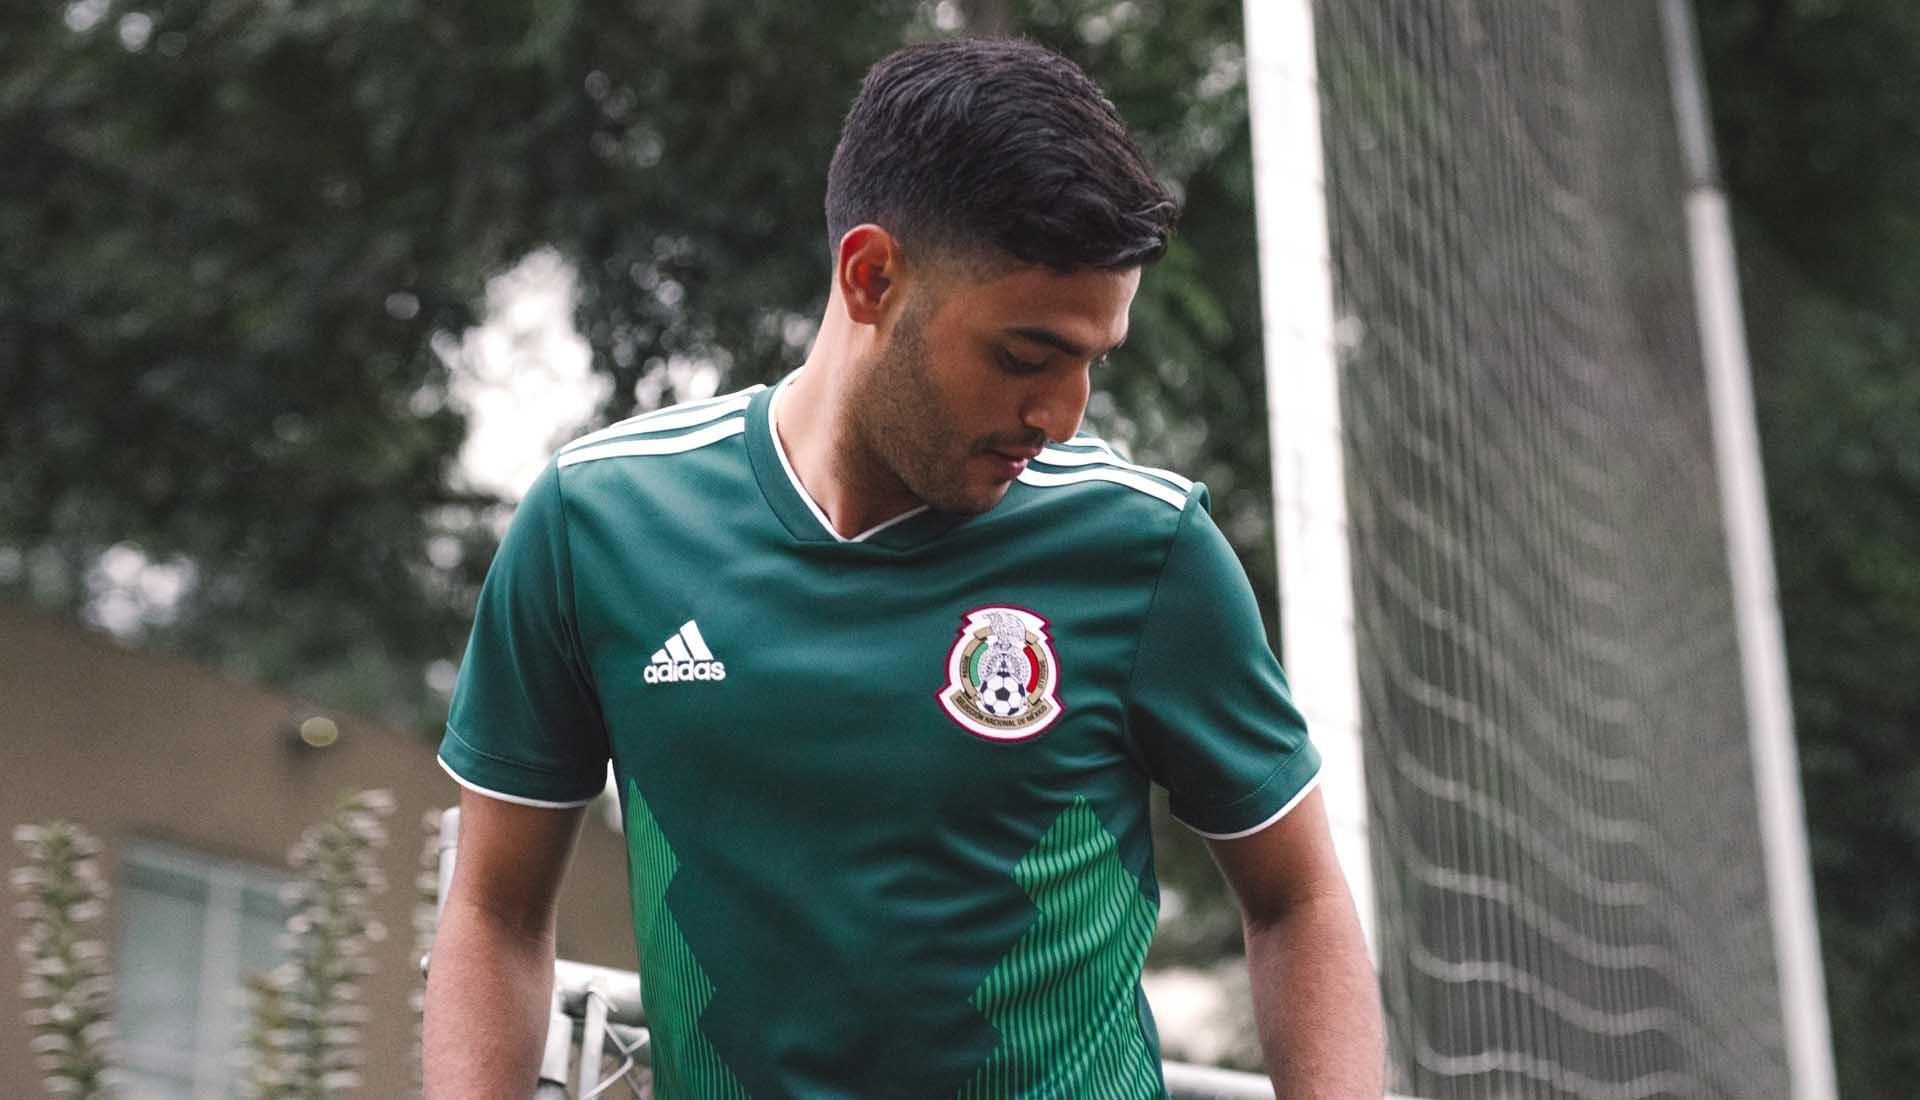 maillot mexique 2018 adidas